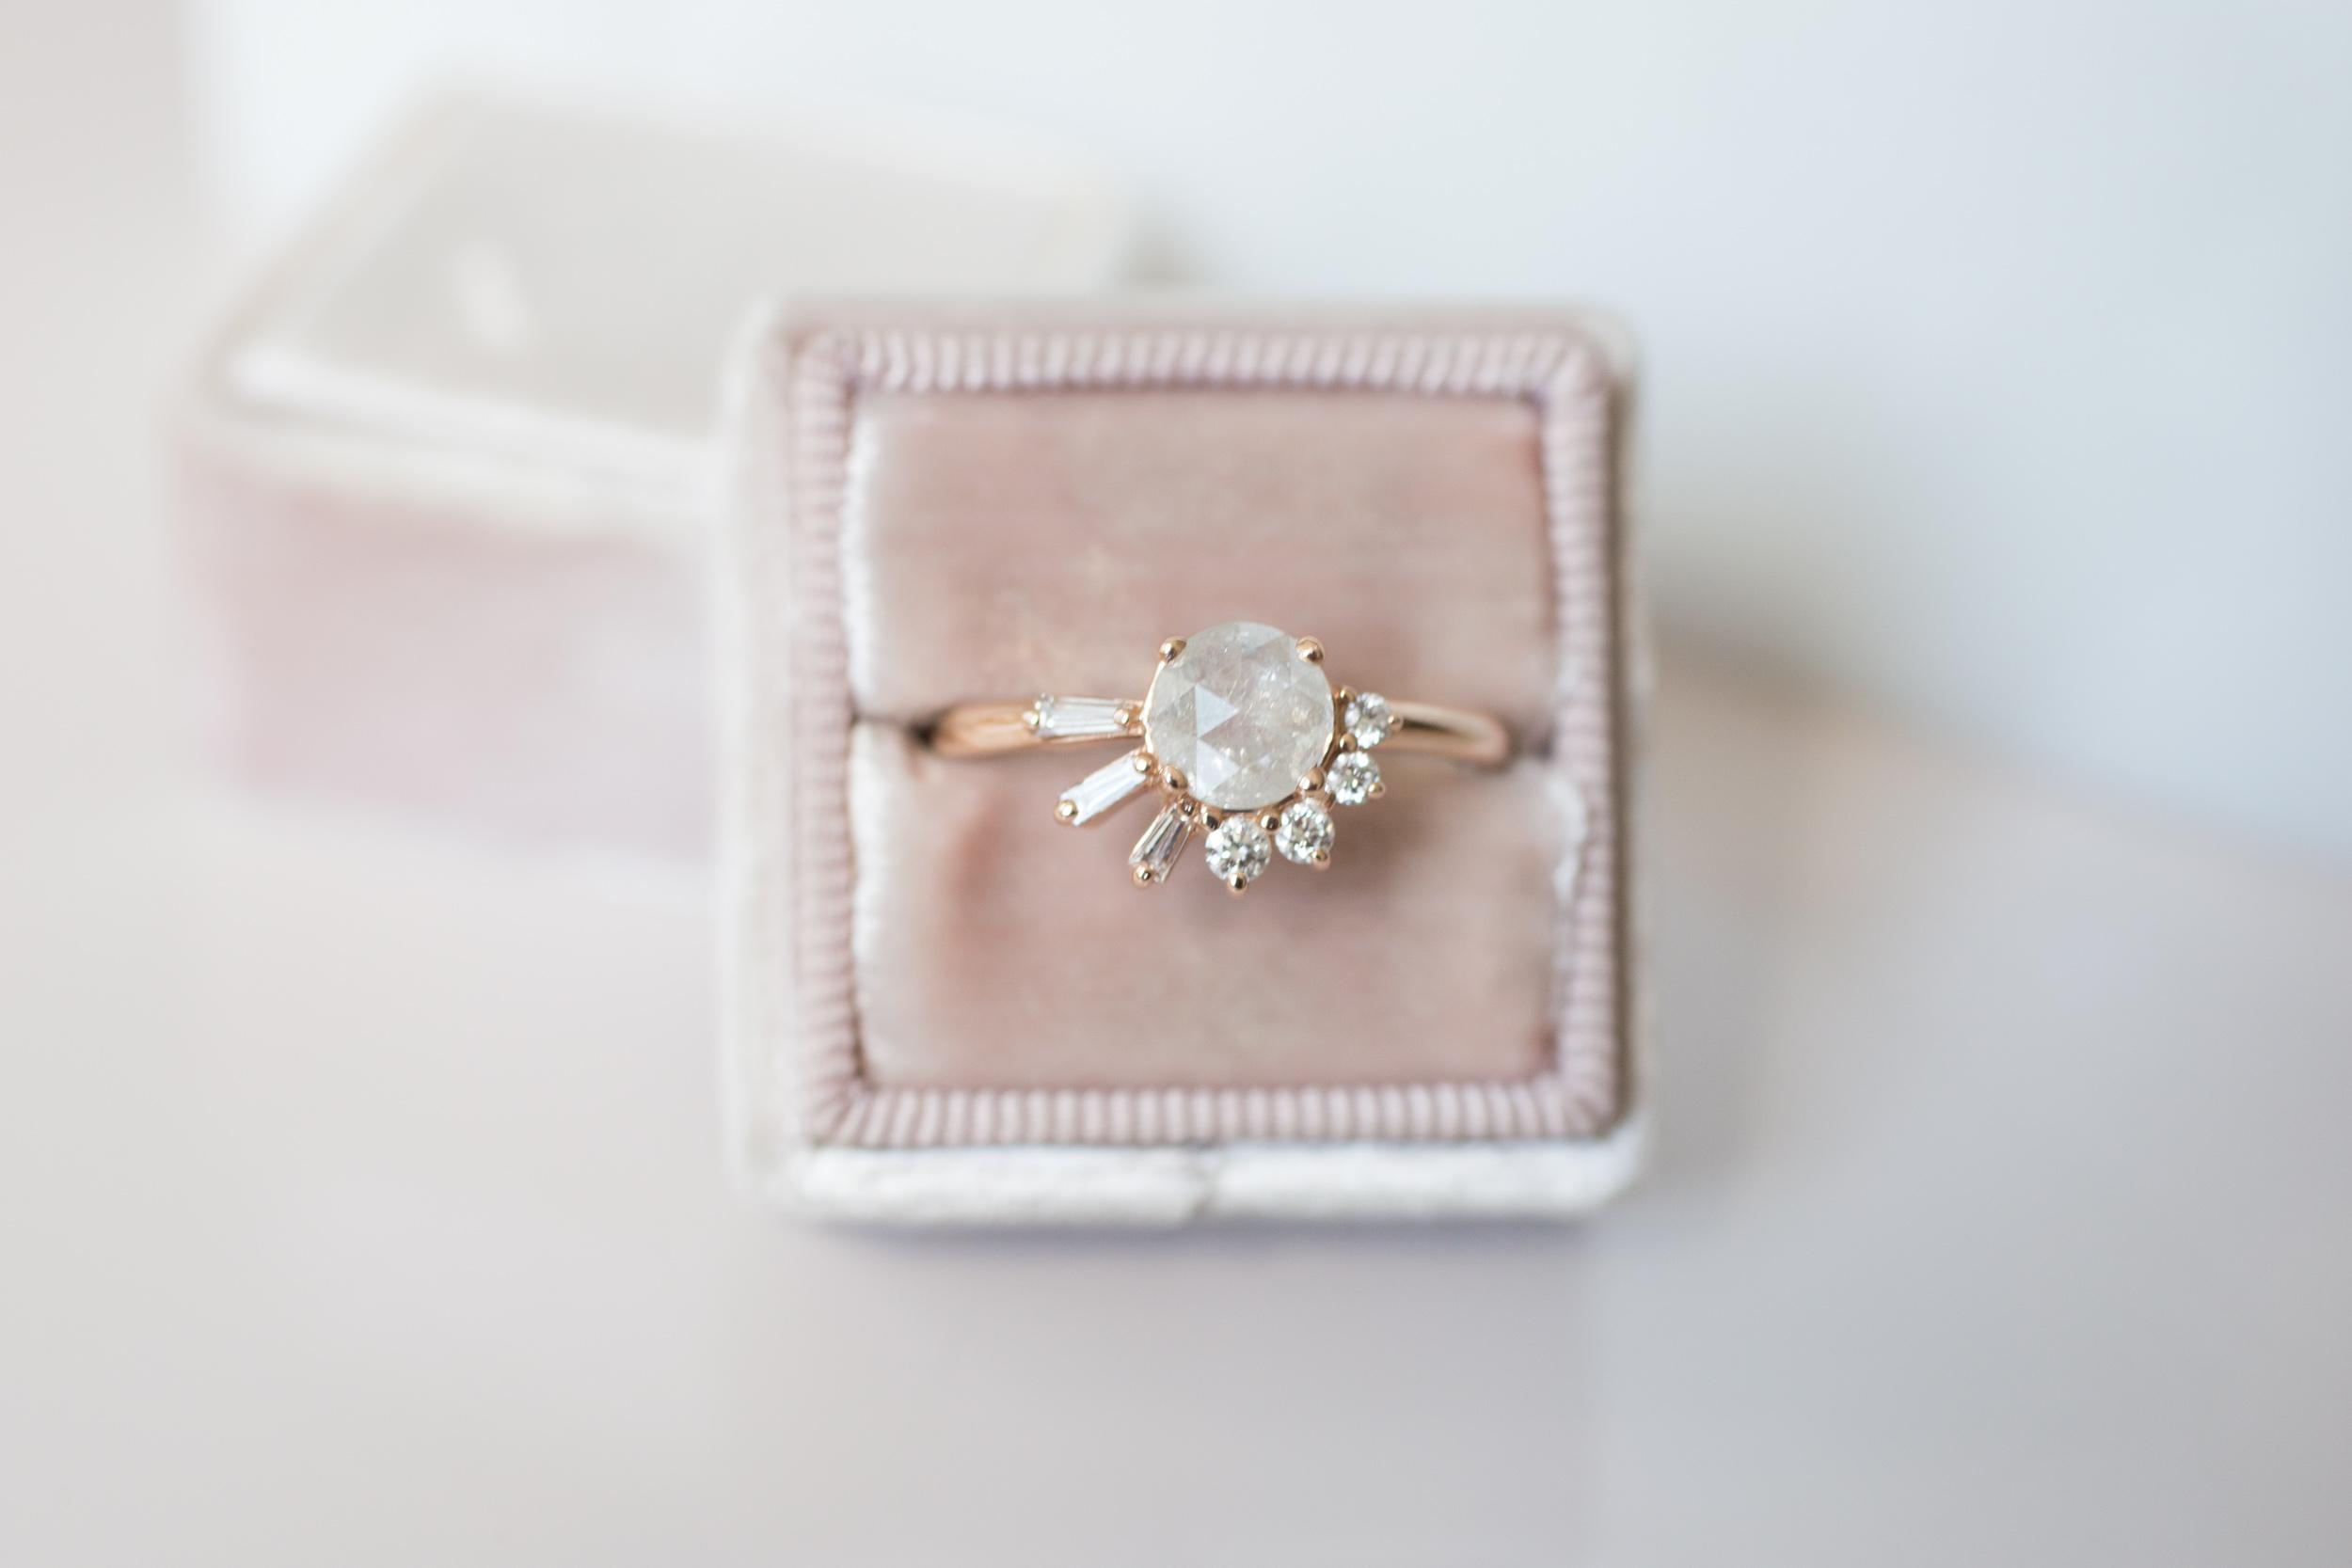 Peter J. Rustic Diamond Baguette Round Cluster Ring-1.jpg